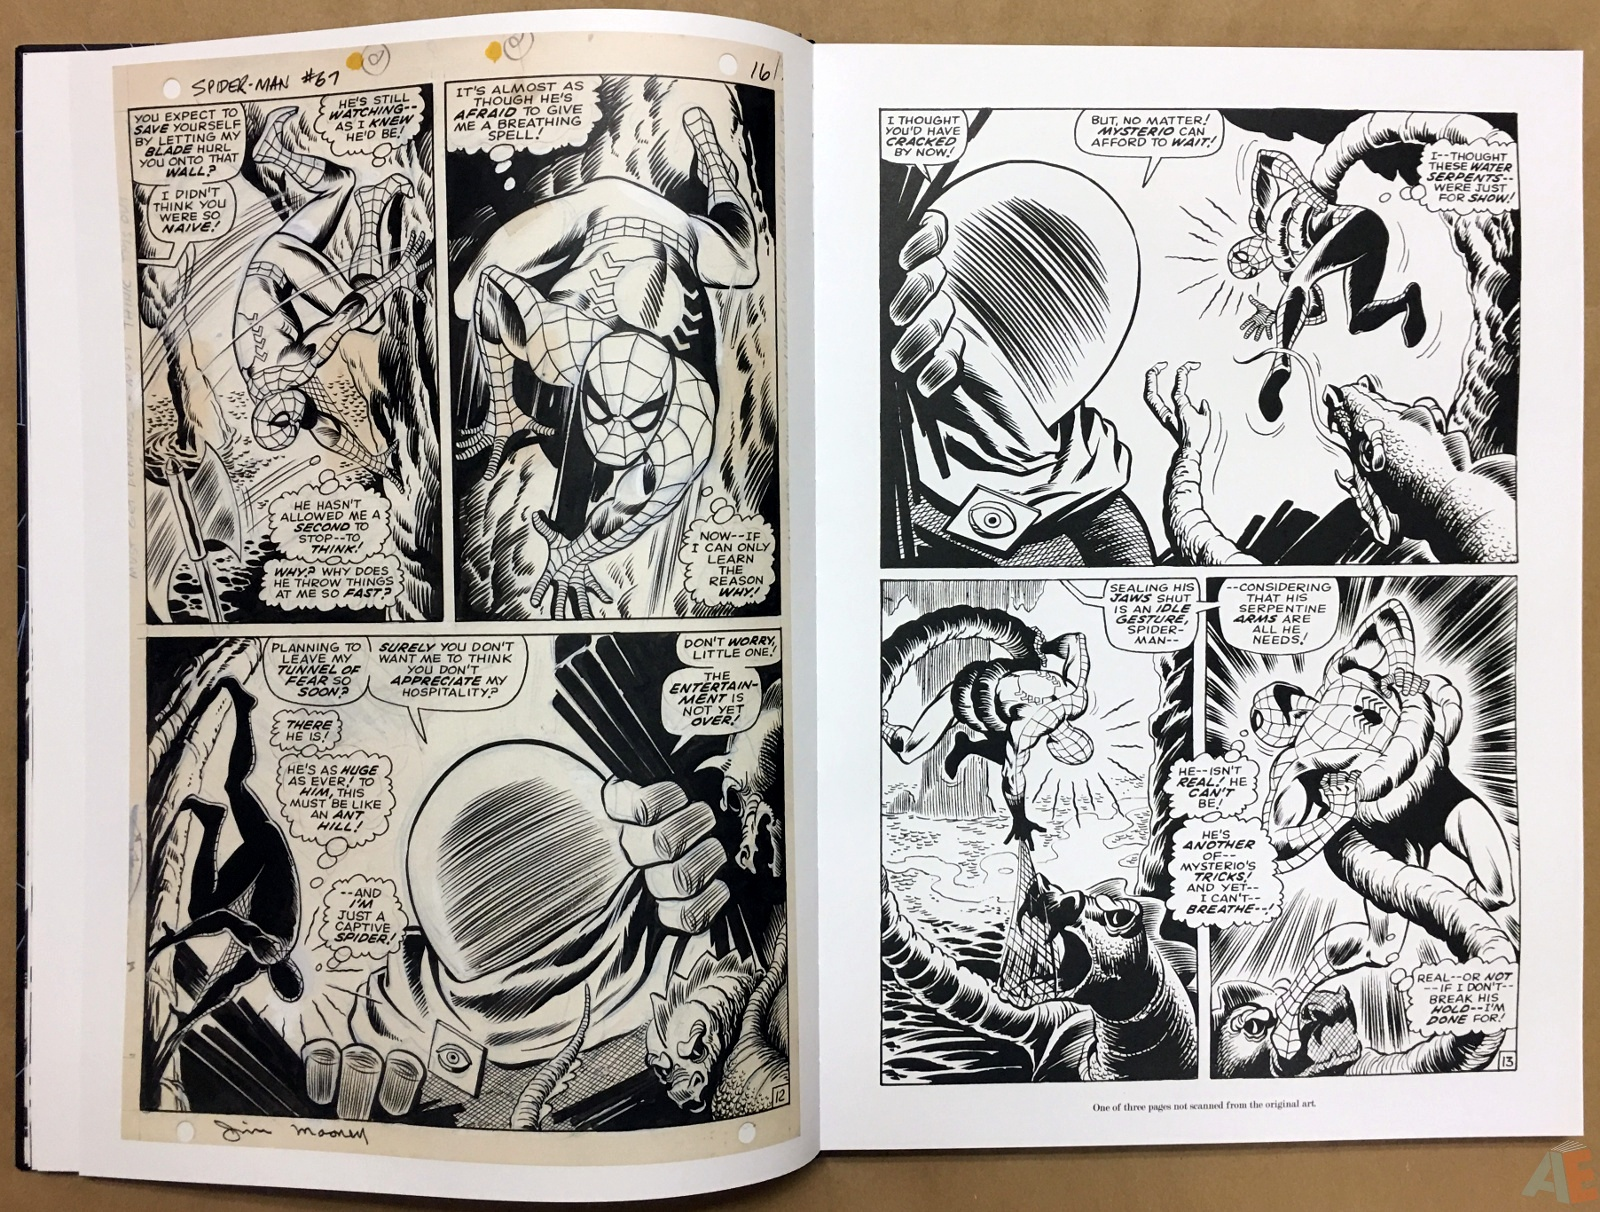 John Romita's The Amazing Spider-Man Artist's Edition 12